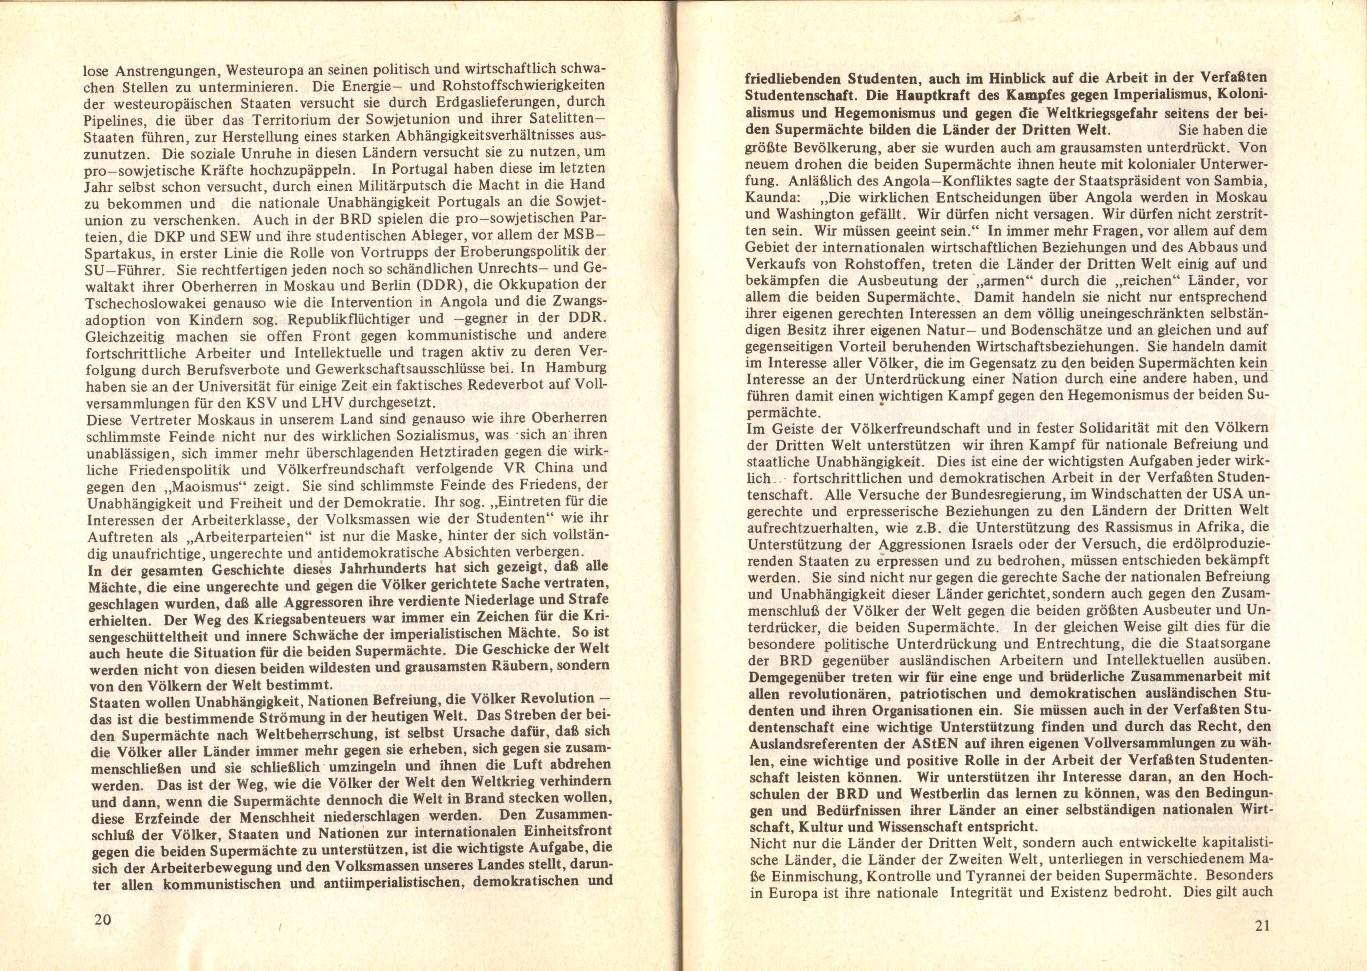 KSV_1976_Verfasste_Studentenschaft_12